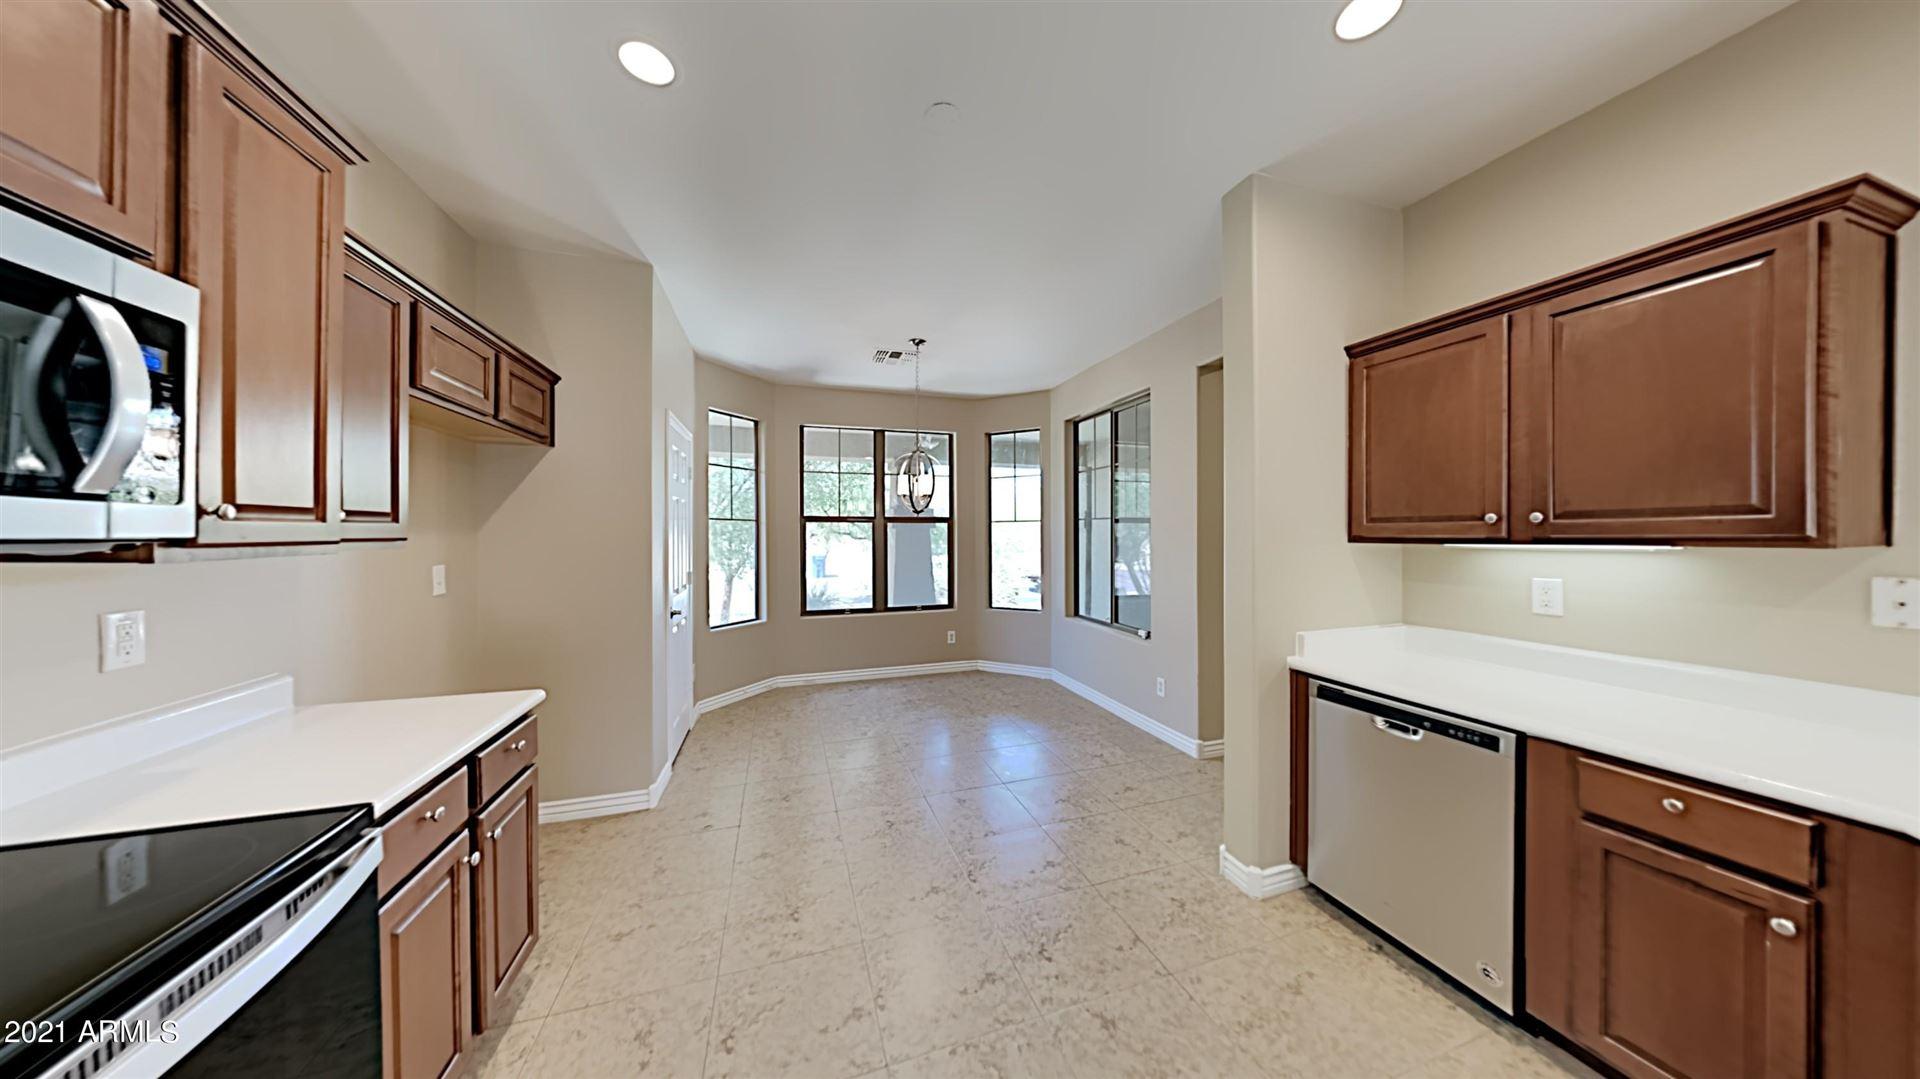 Photo of 135 S 108TH Avenue, Avondale, AZ 85323 (MLS # 6230903)